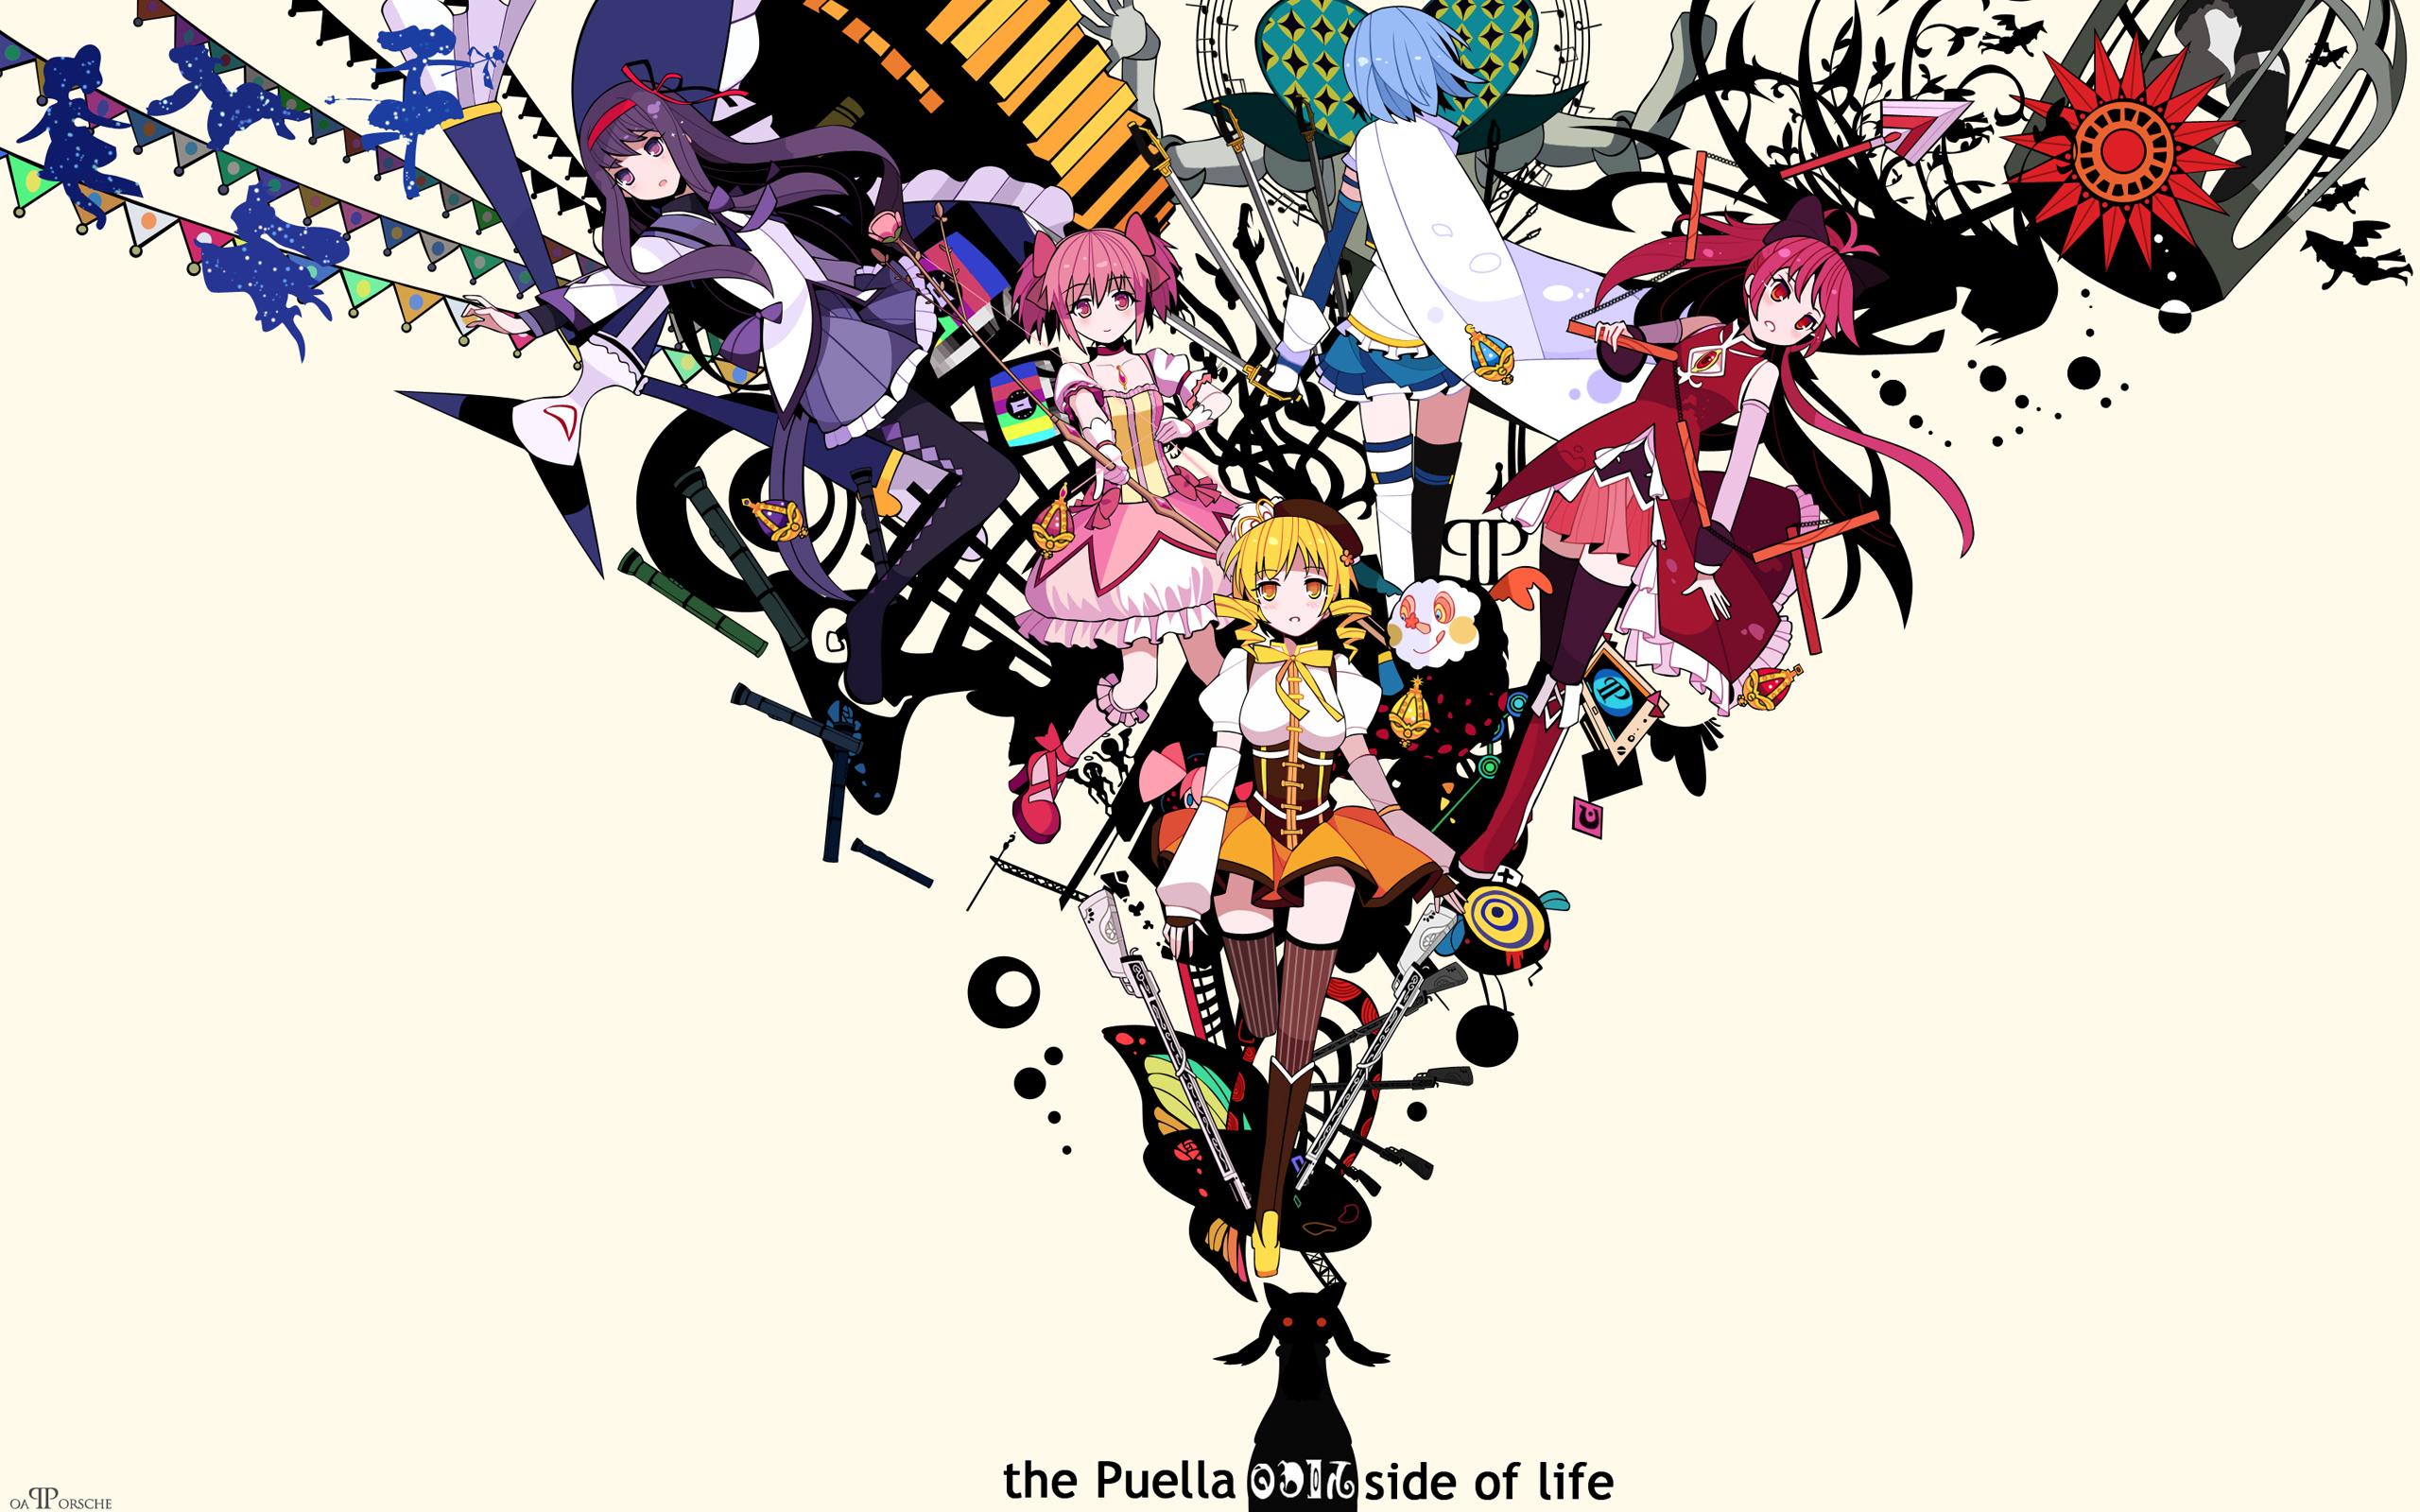 Puella Magi Madoka Magica Hd Wallpaper Background Image 2560x1600 Id 789182 Wallpaper Abyss